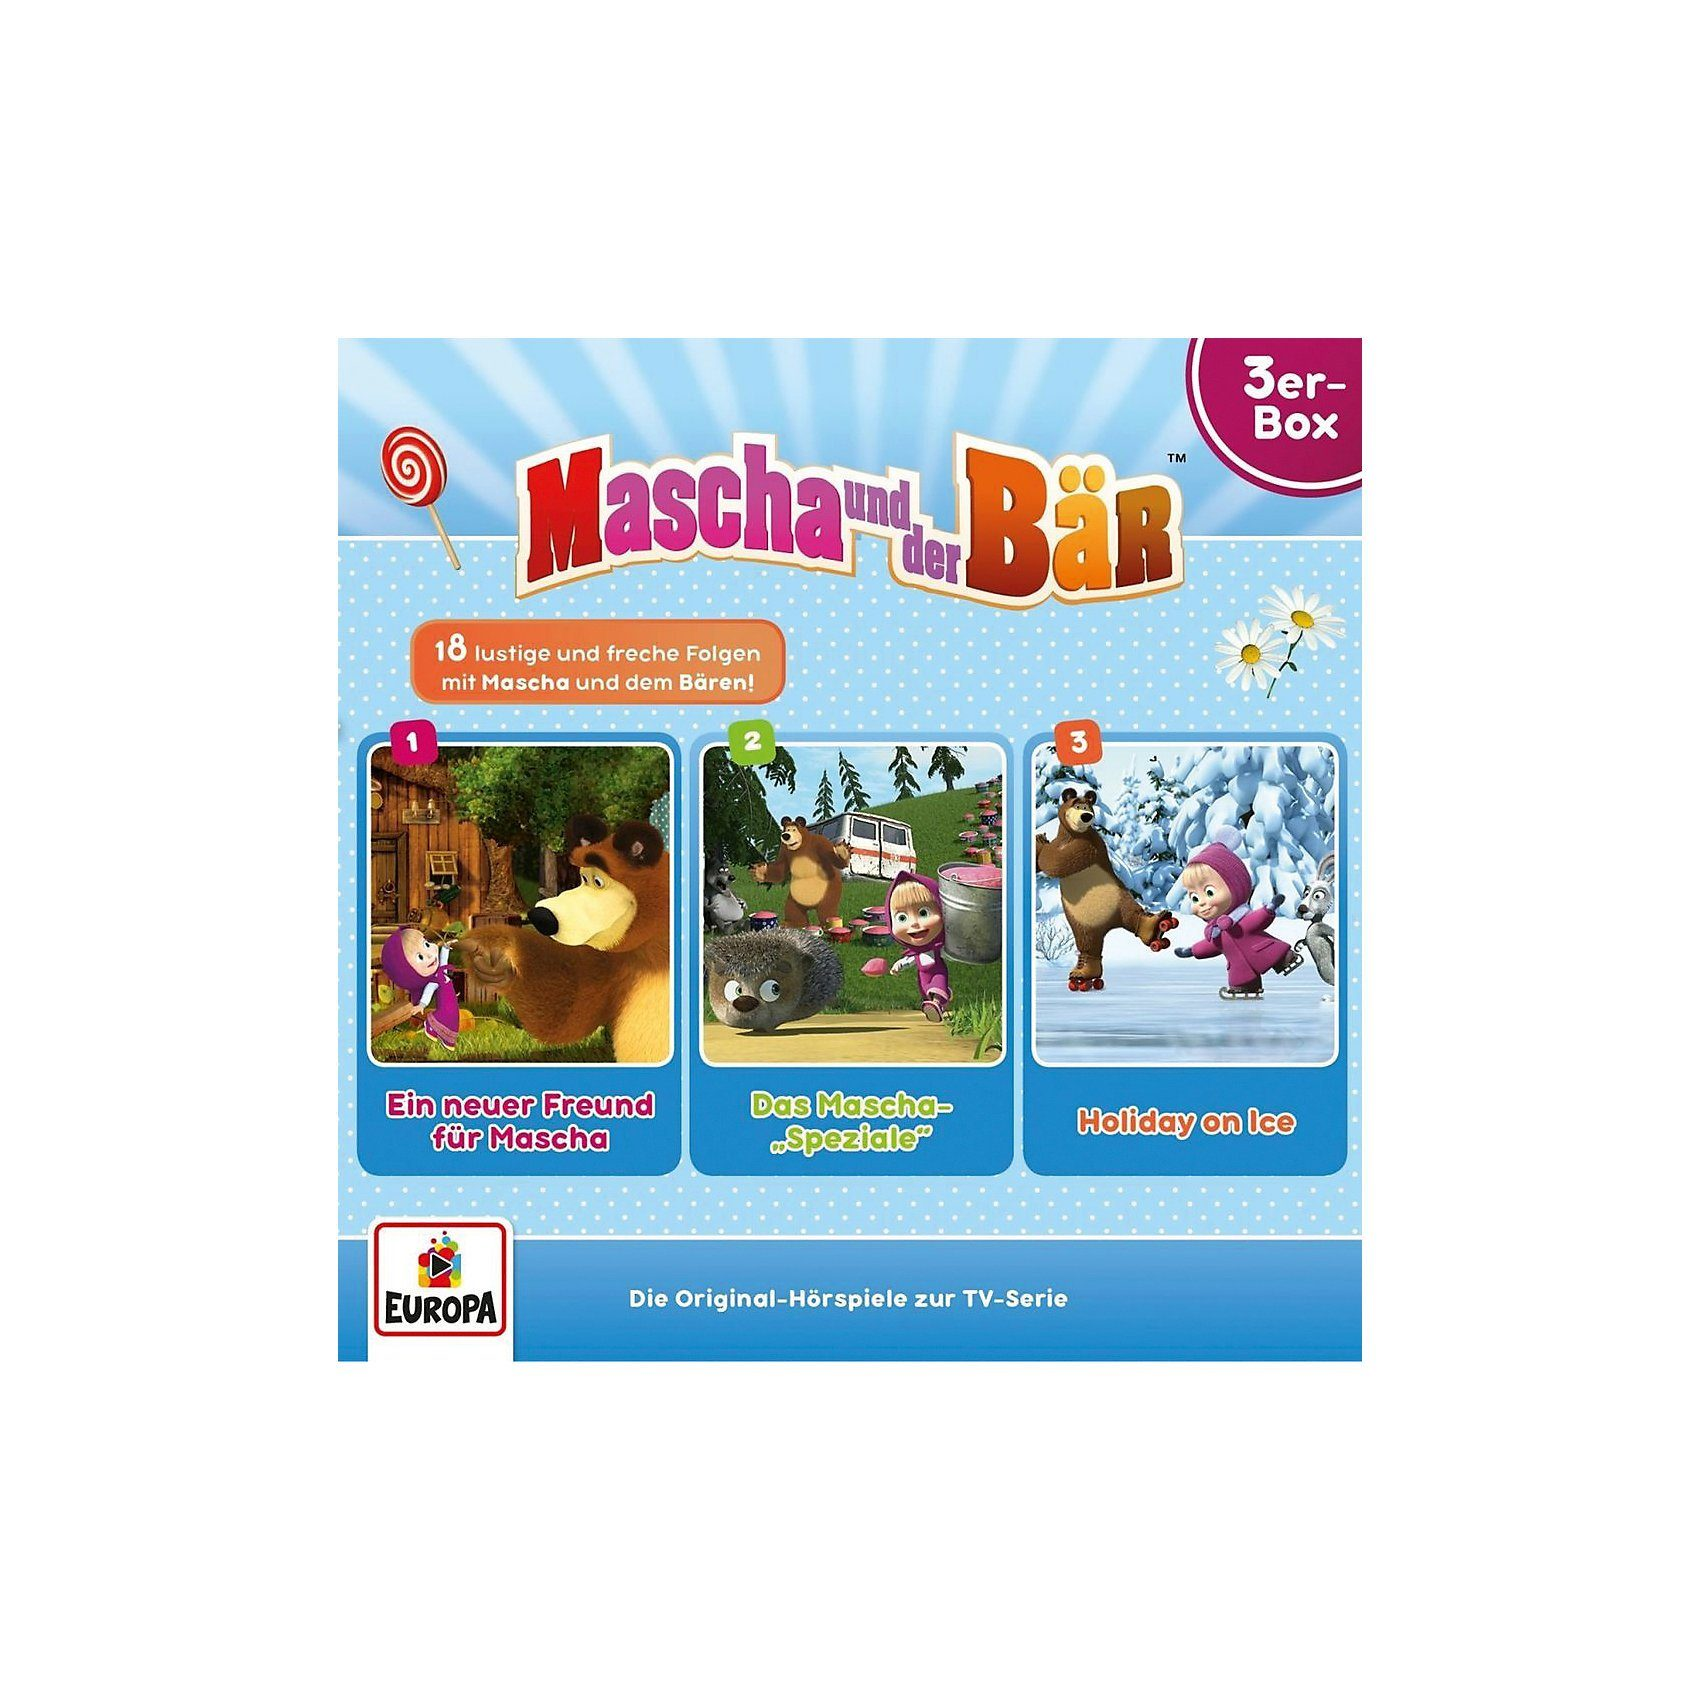 Sony CD Mascha und der Bär 01/ 3er Box (Folgen 1,2,3) (3 CDs)